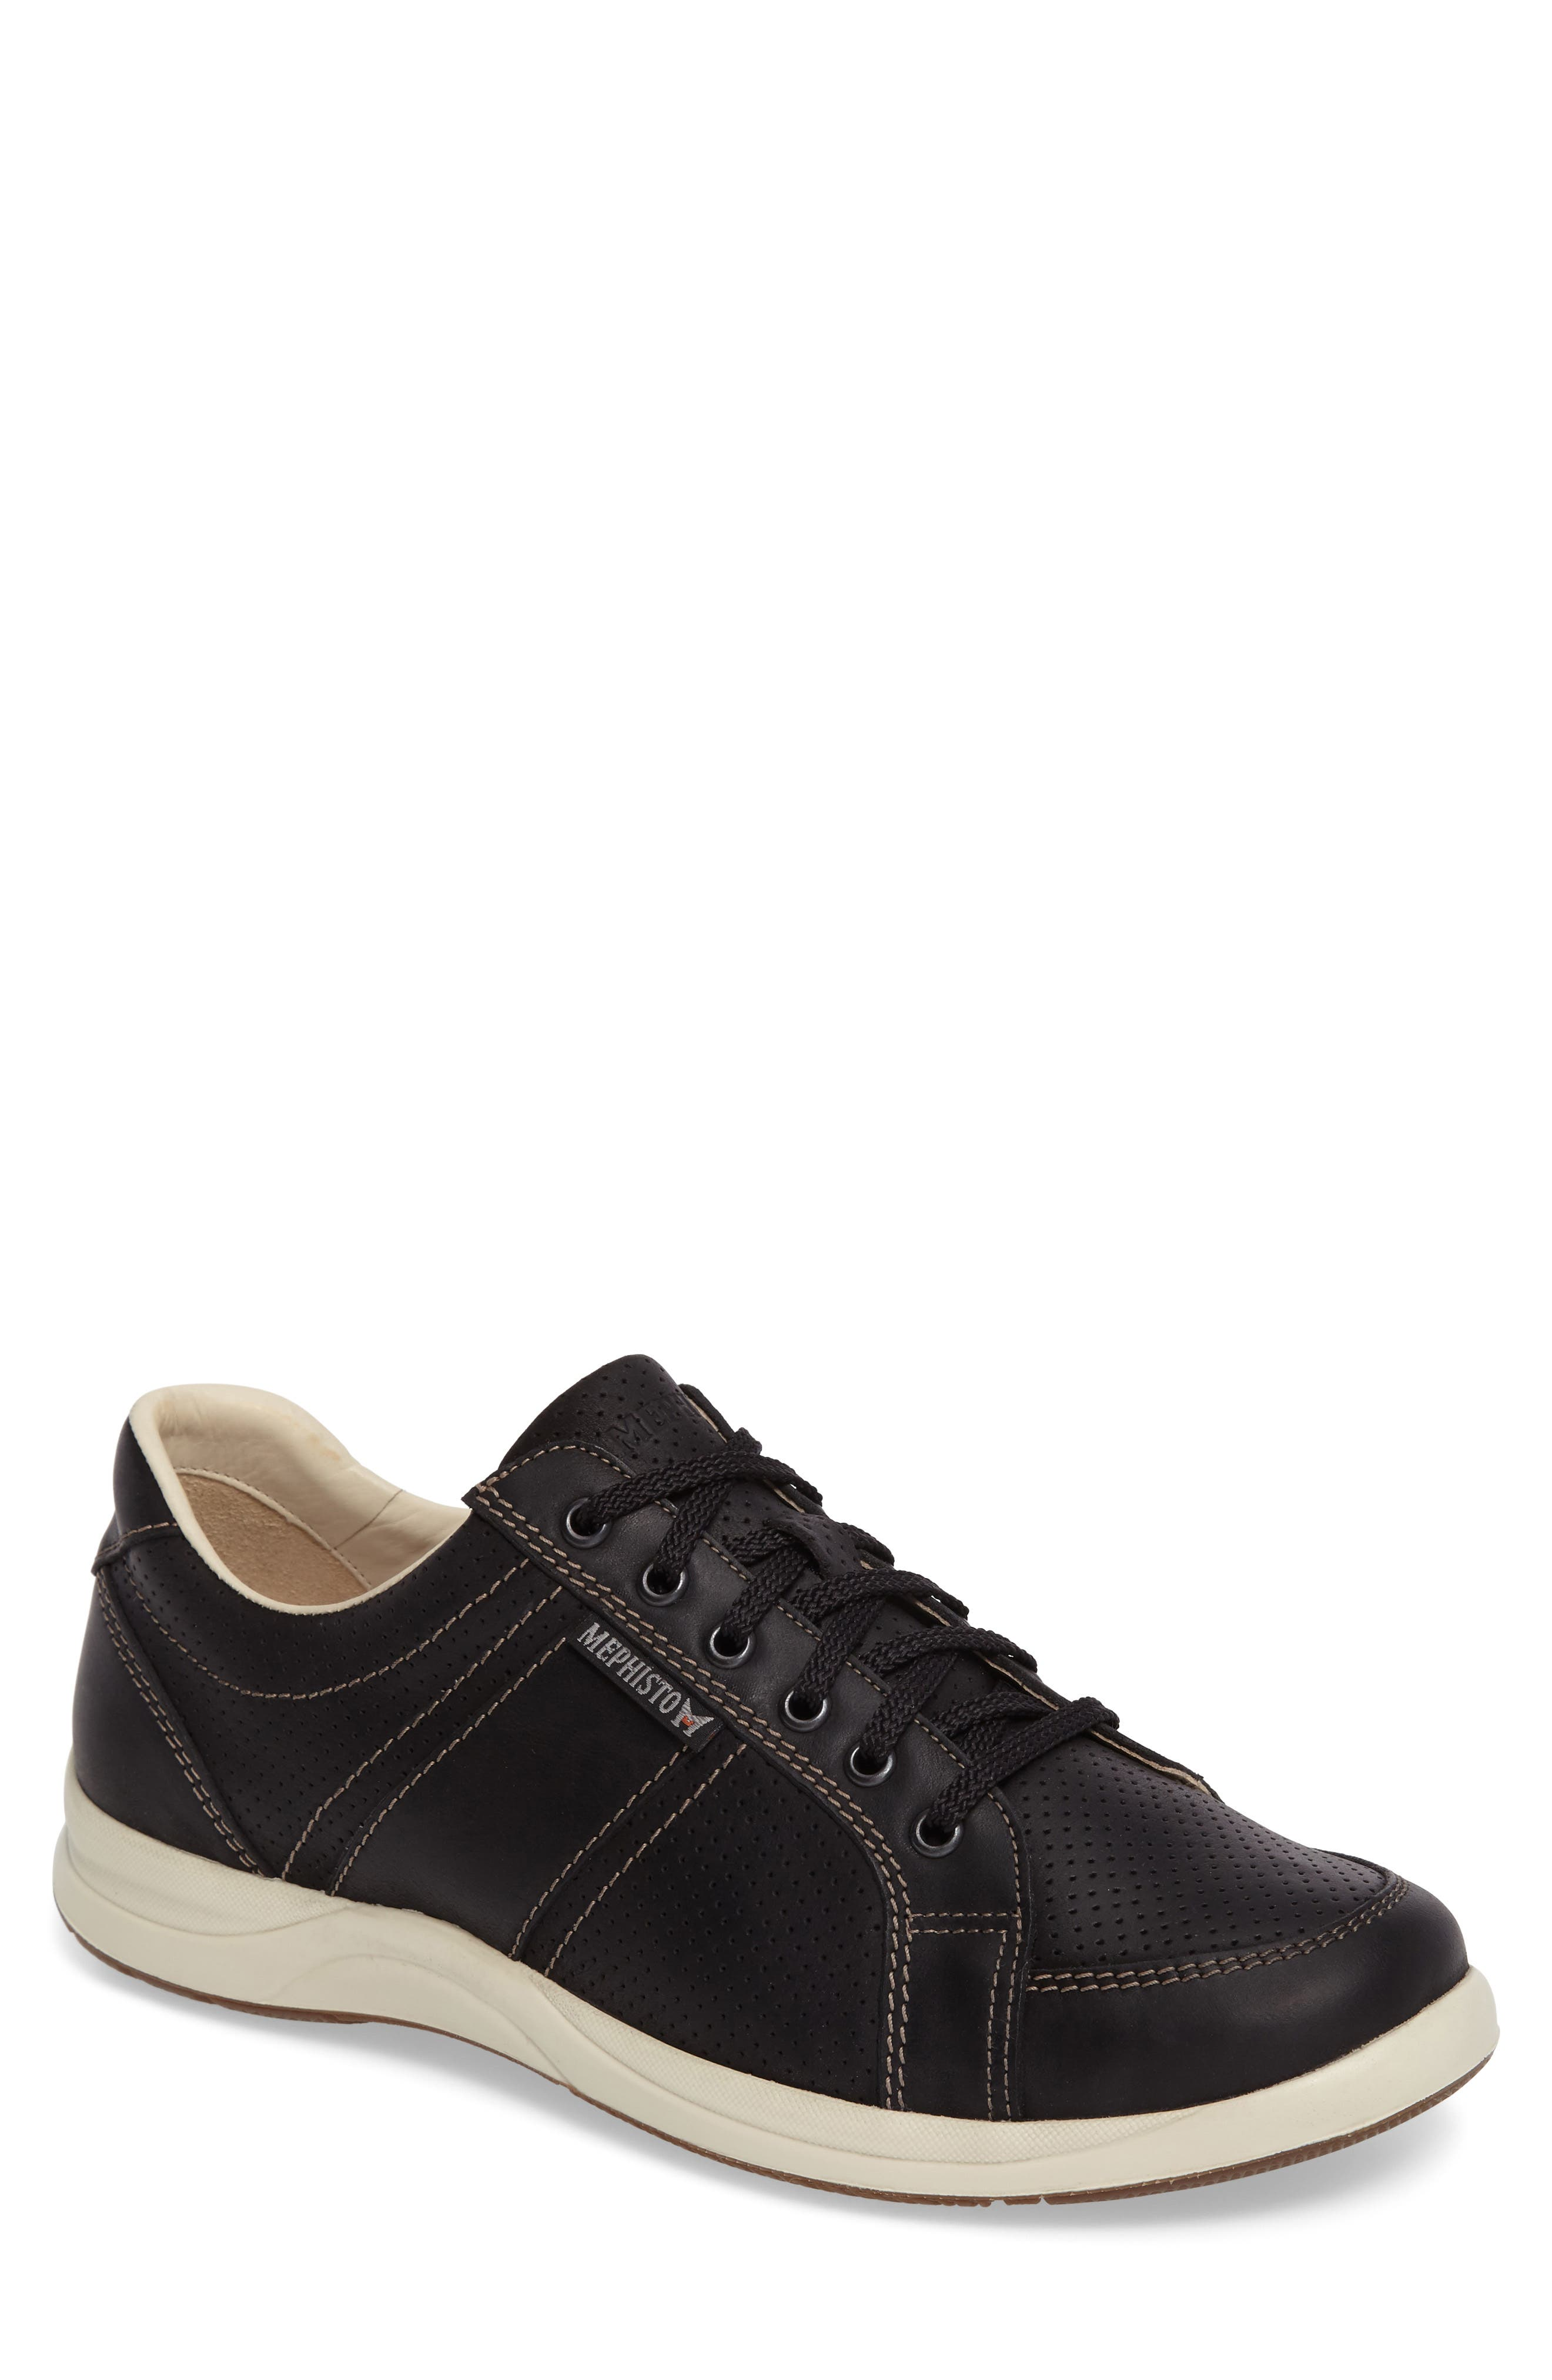 'Hero' Perforated Sneaker,                             Main thumbnail 1, color,                             Black Nubuck Leather